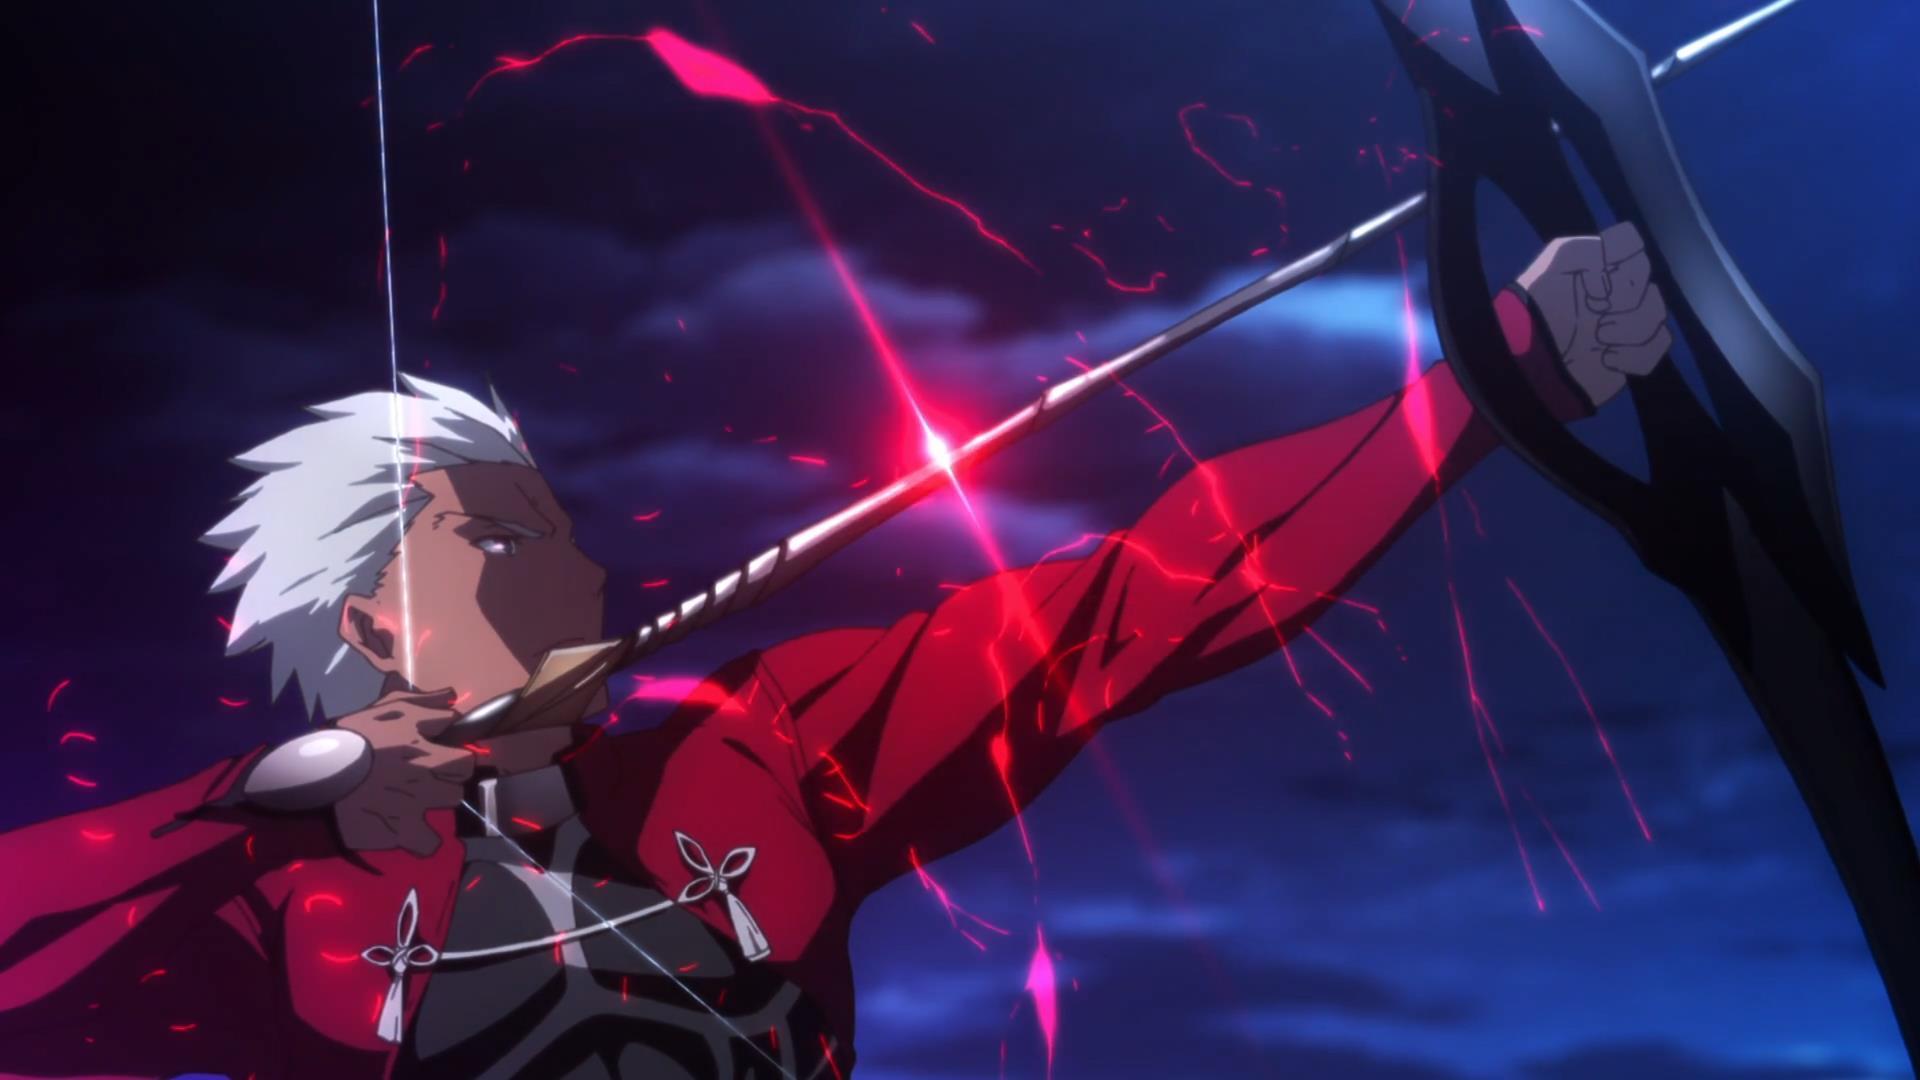 arcieri negli anime - archer